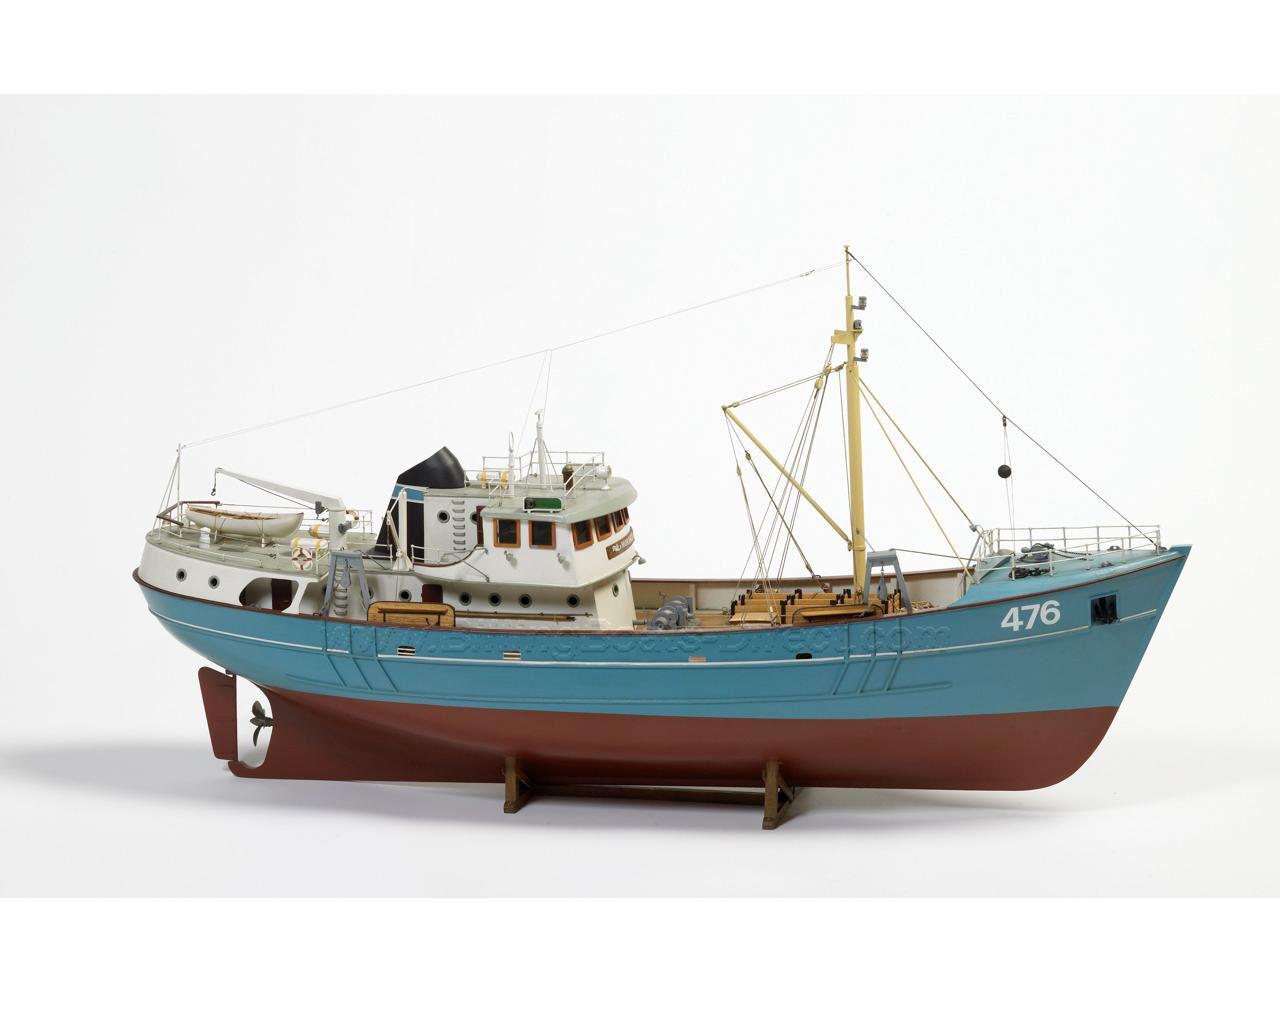 795-7984-Nordkap-Model-Boat-Kit